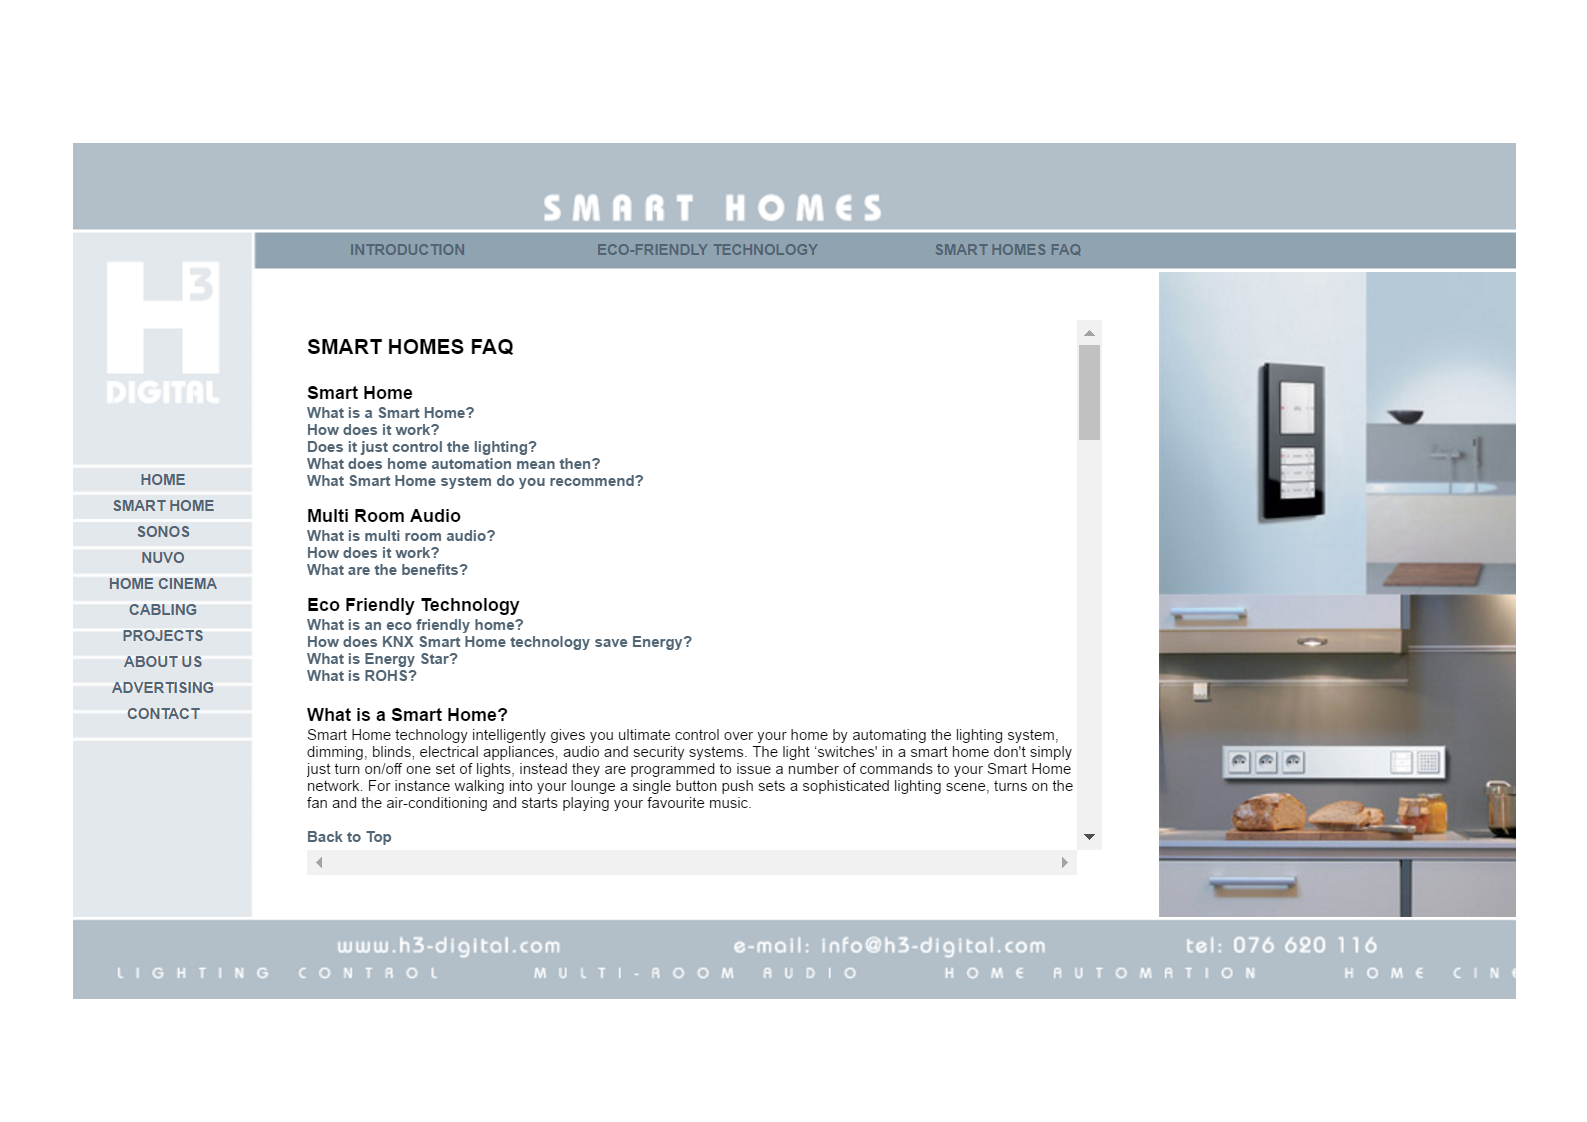 Smart Homes FAQ in 2009